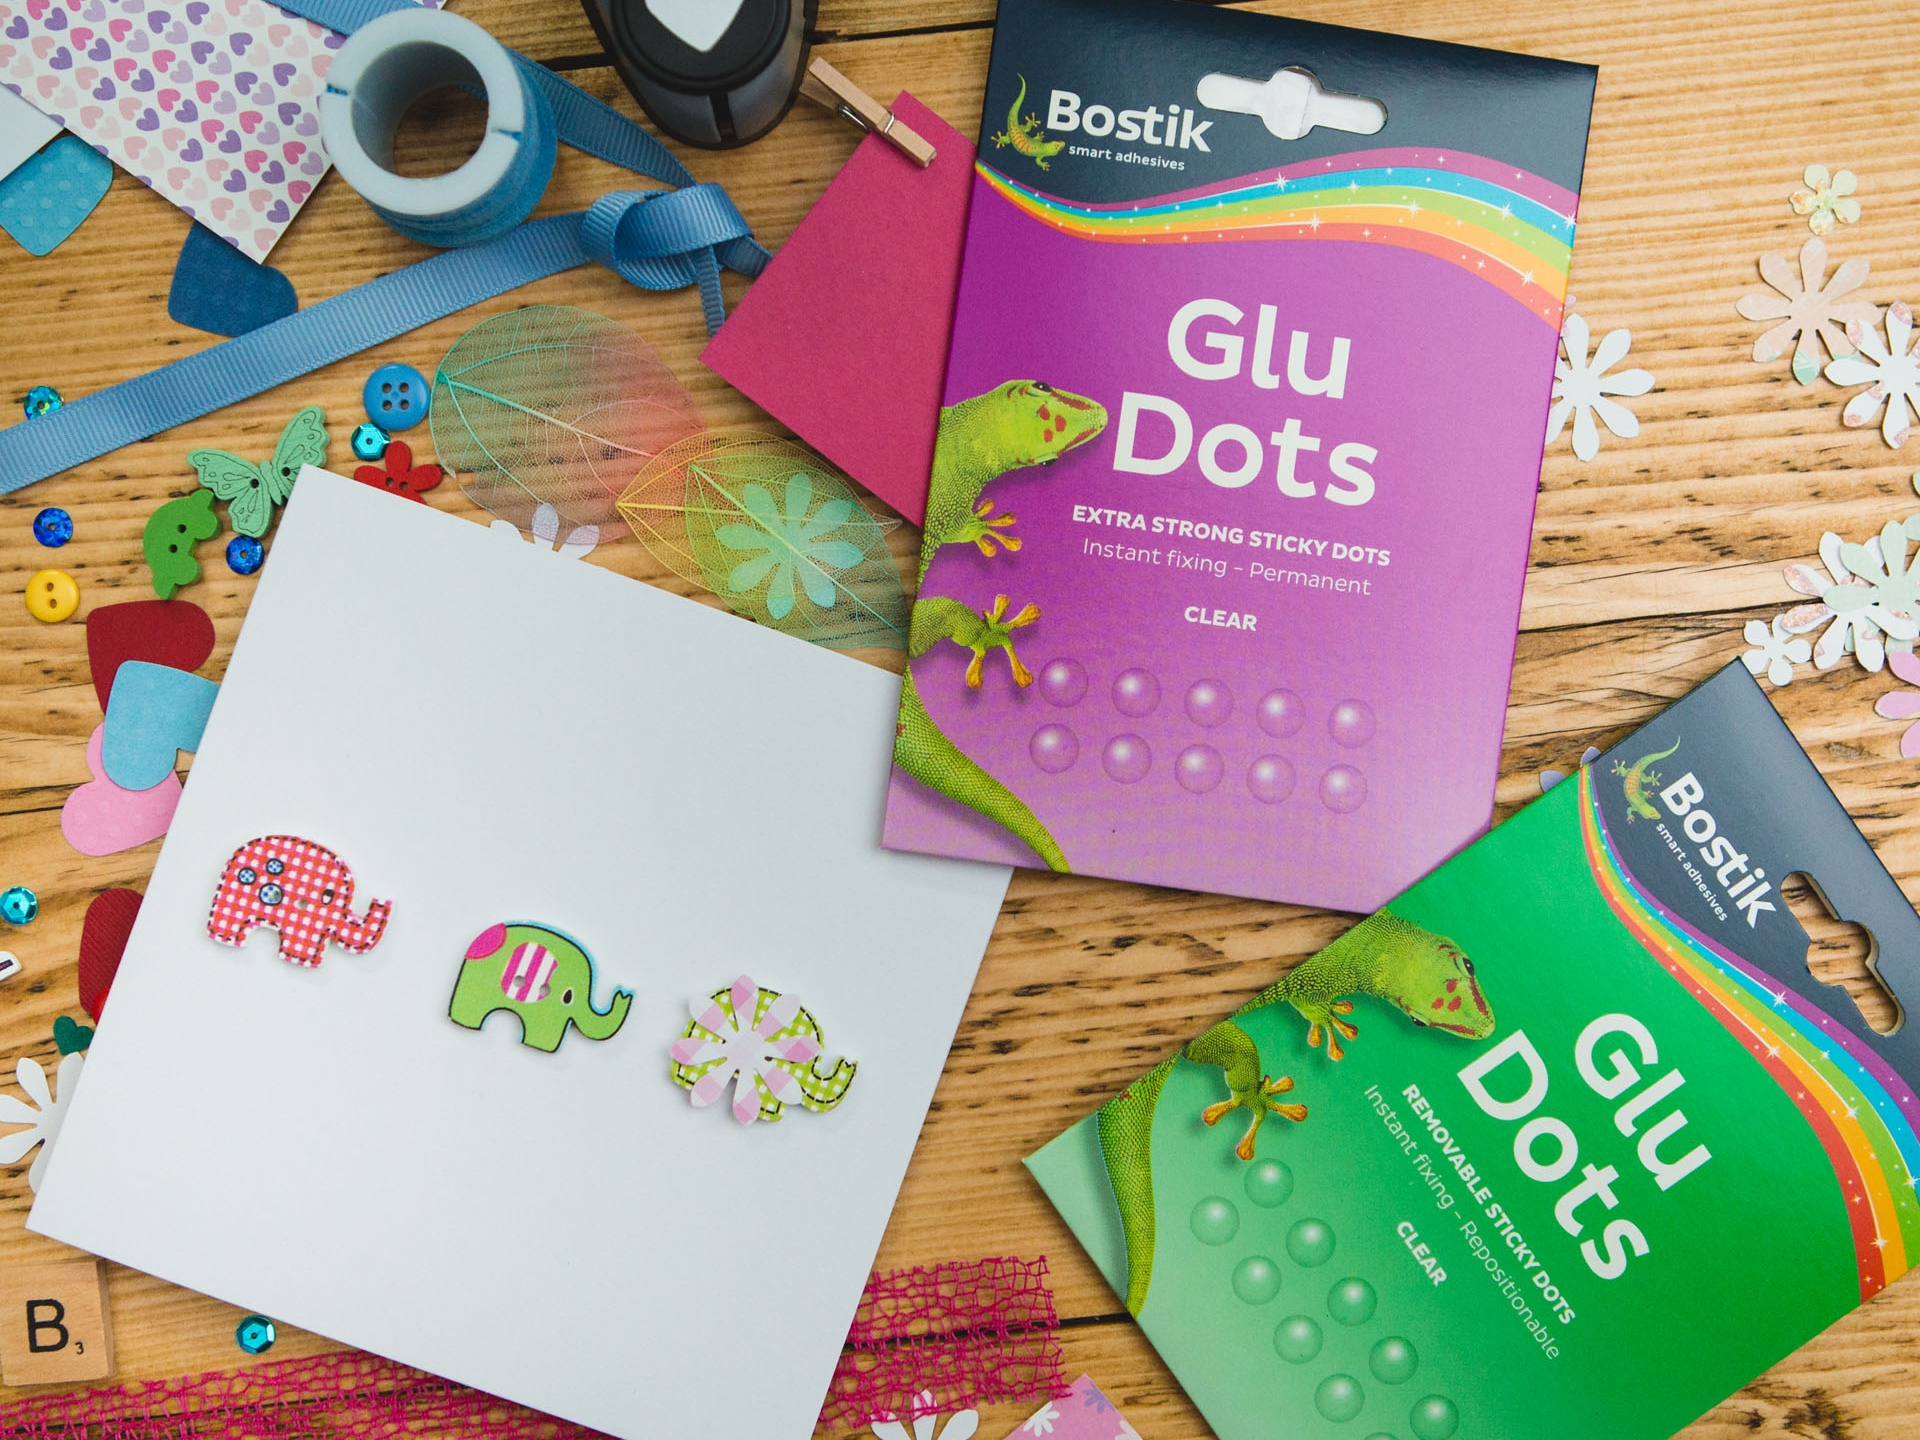 Bostik DIY Glu Dots White United Kingdom Impression